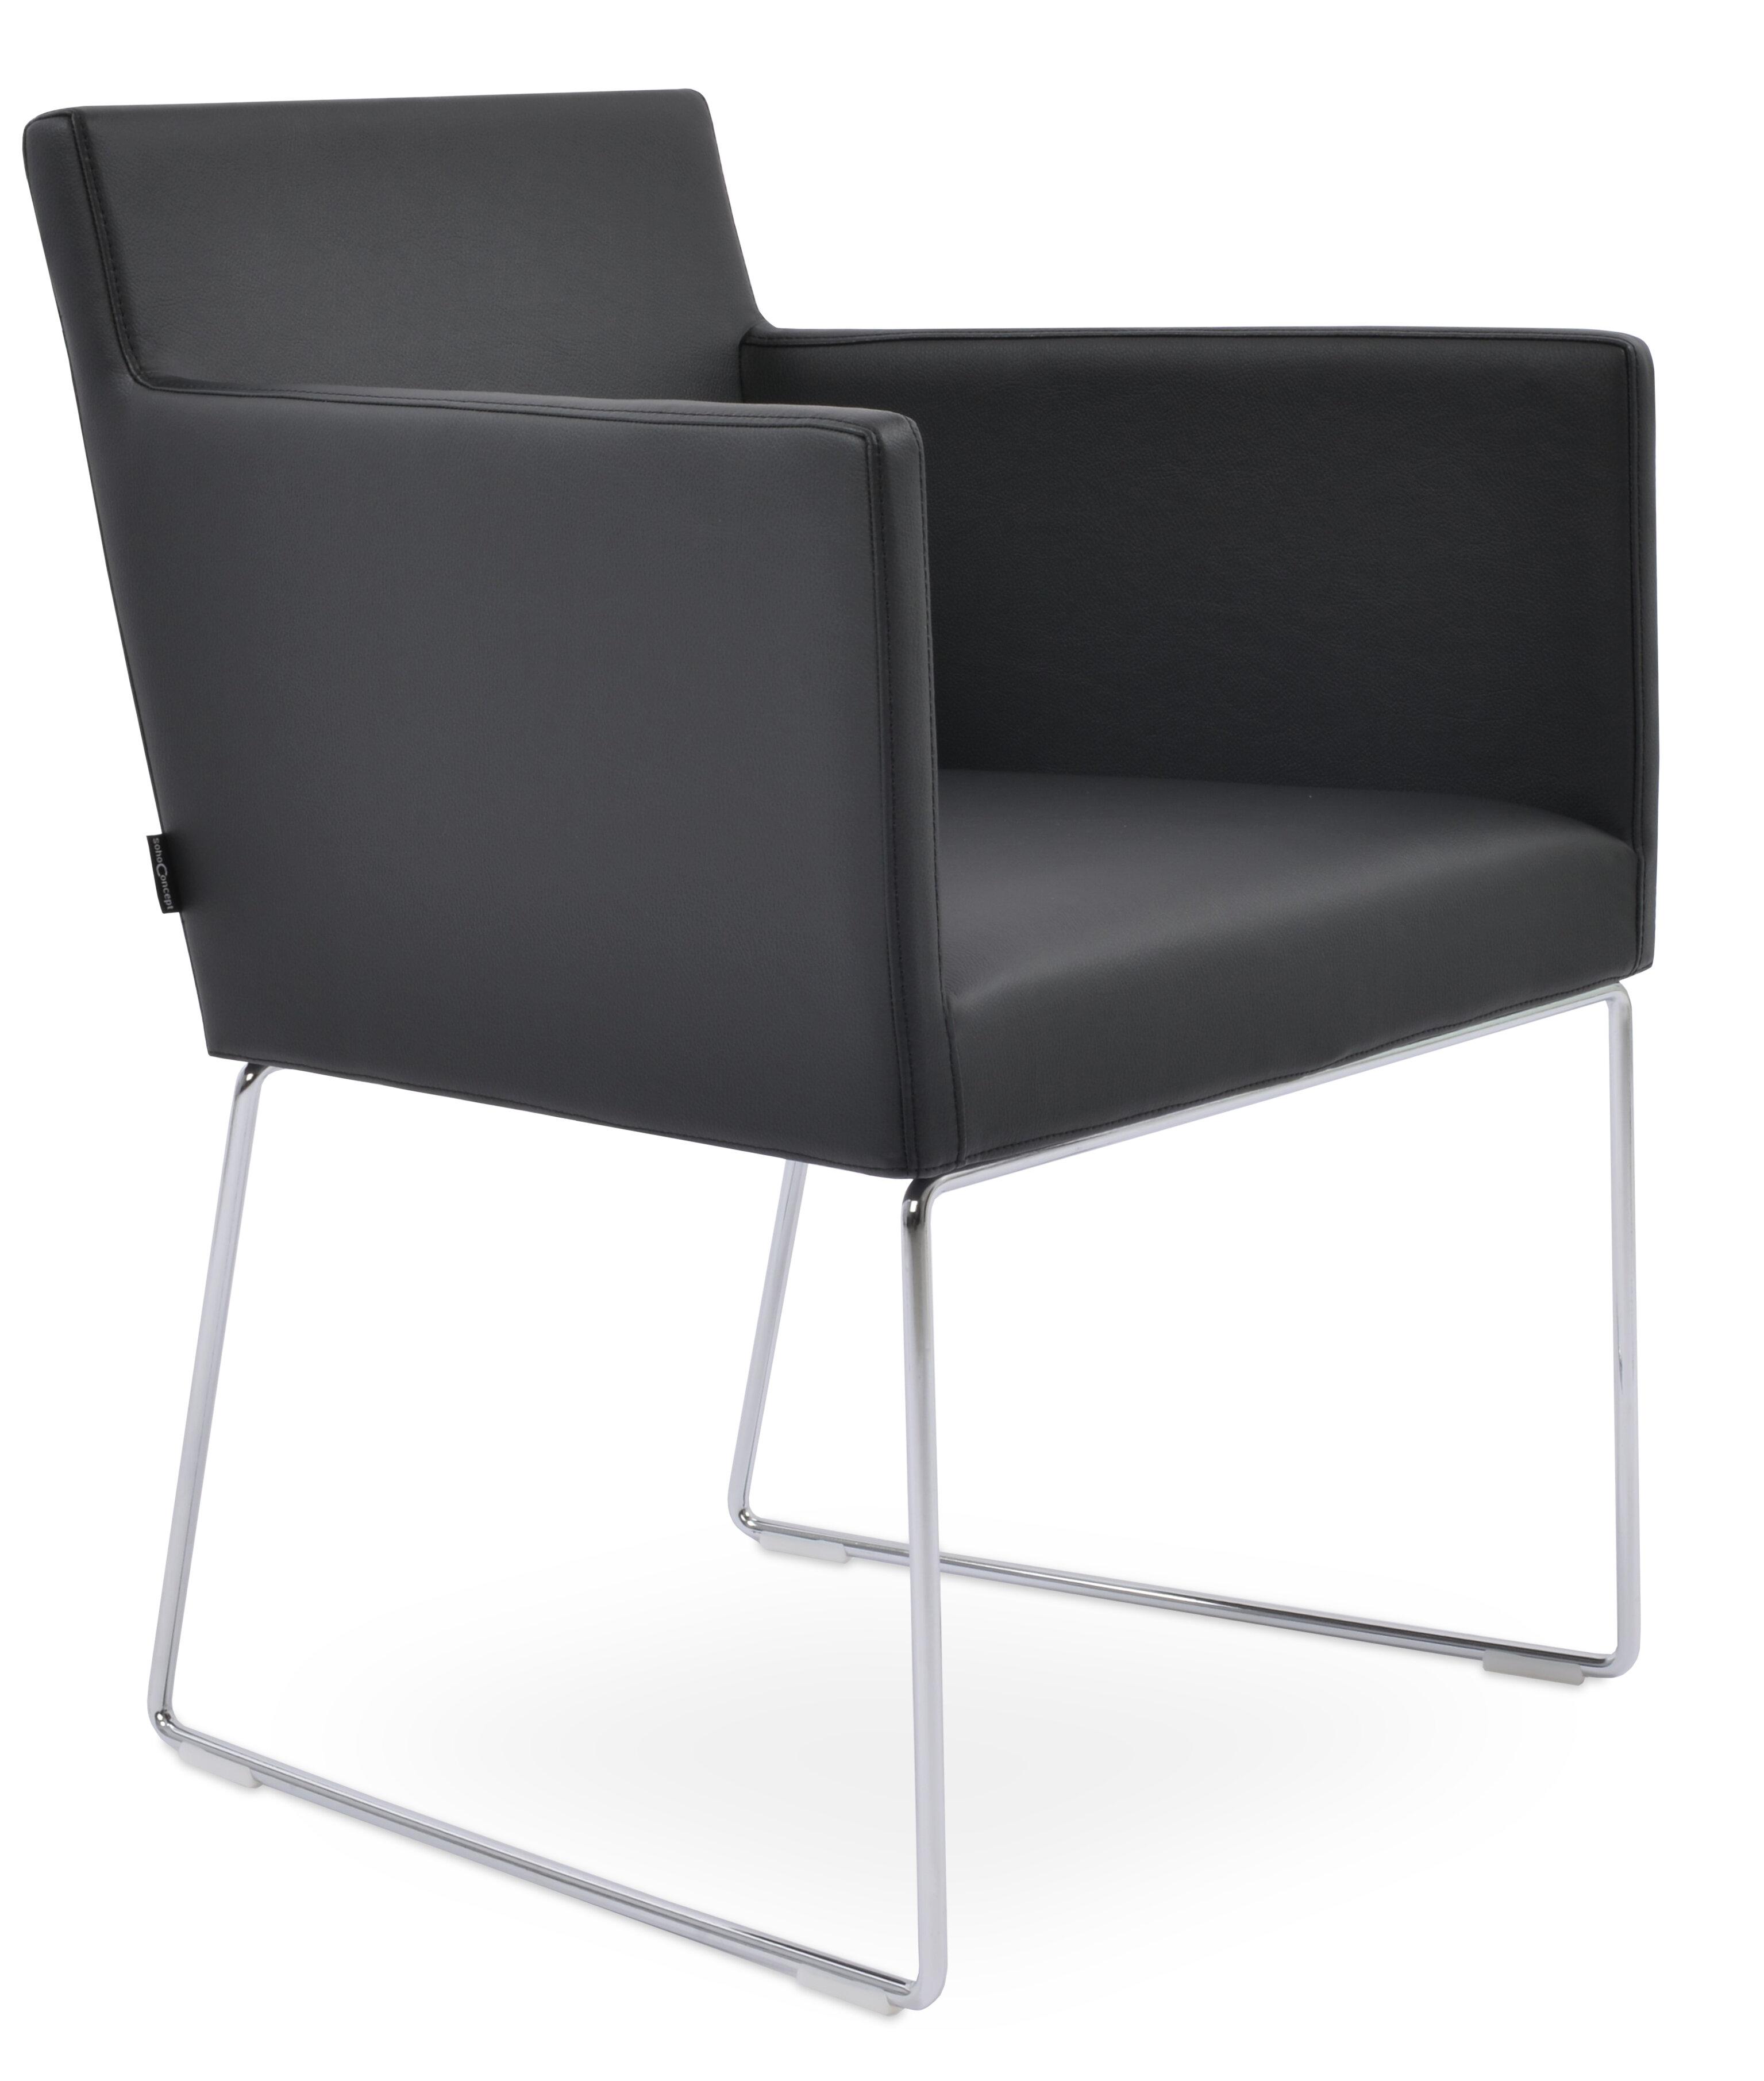 Sohoconcept Harput Wire Dining Chair Wayfair